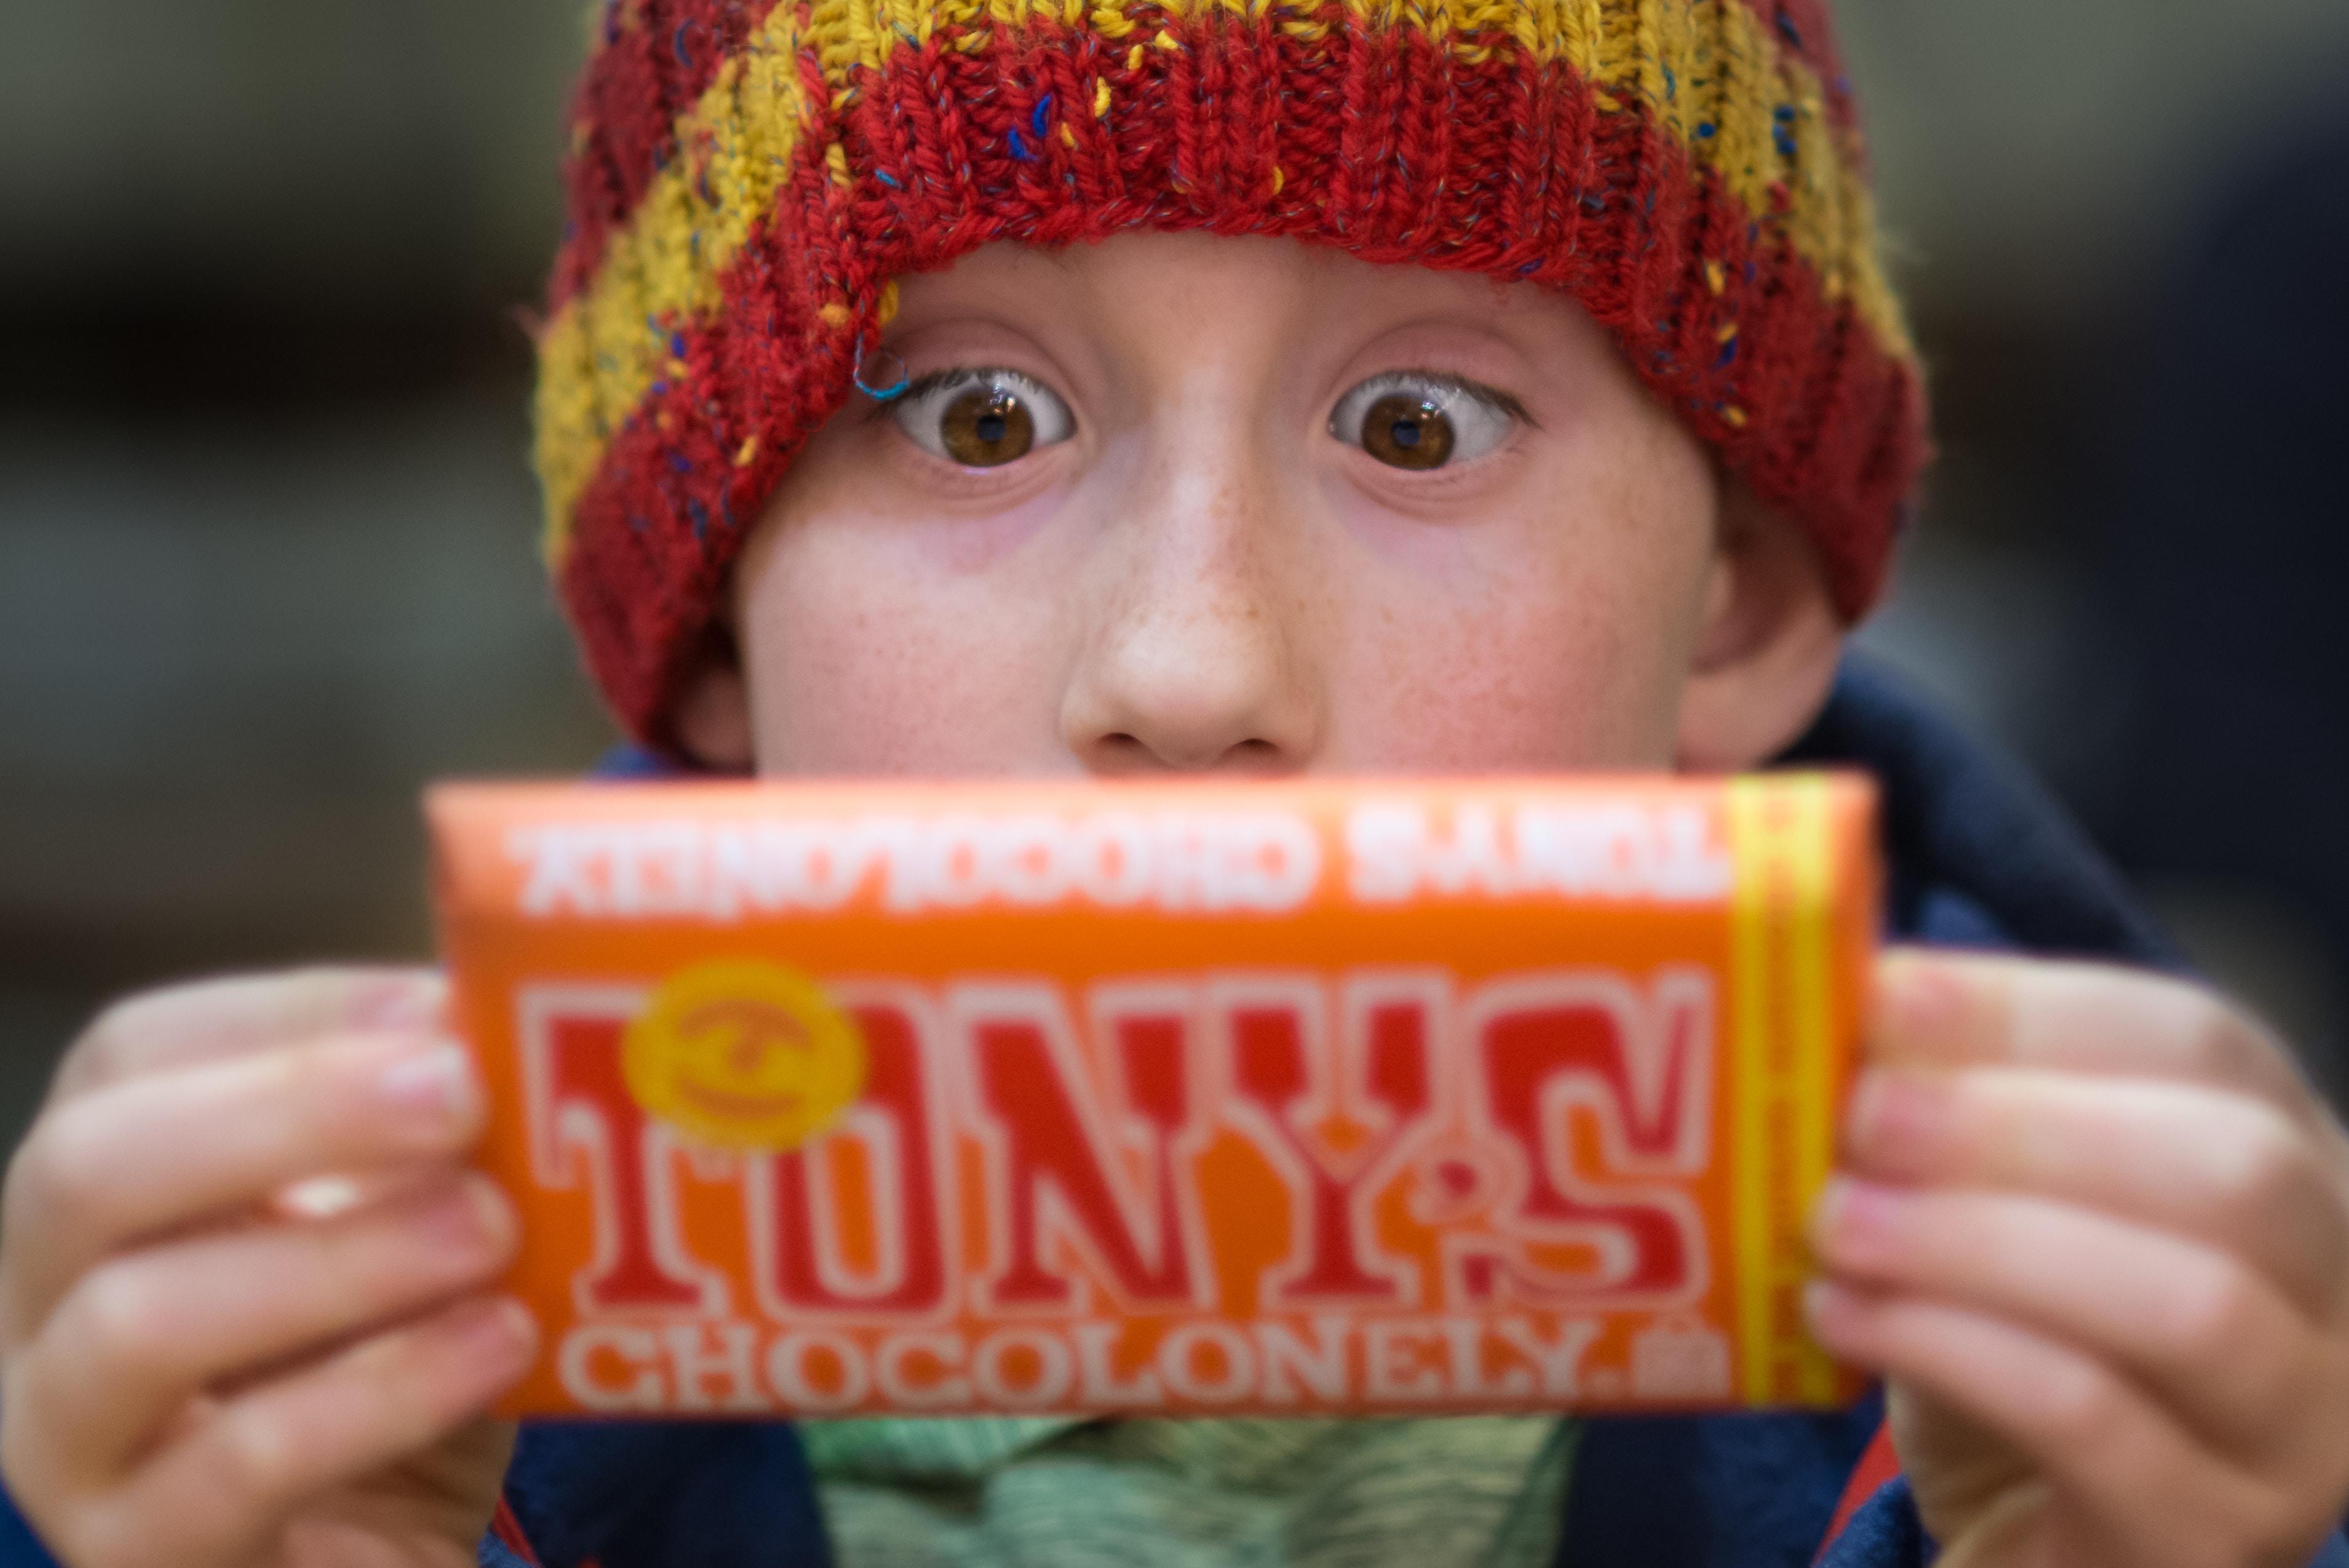 boy holding Tony's chocoloney pack